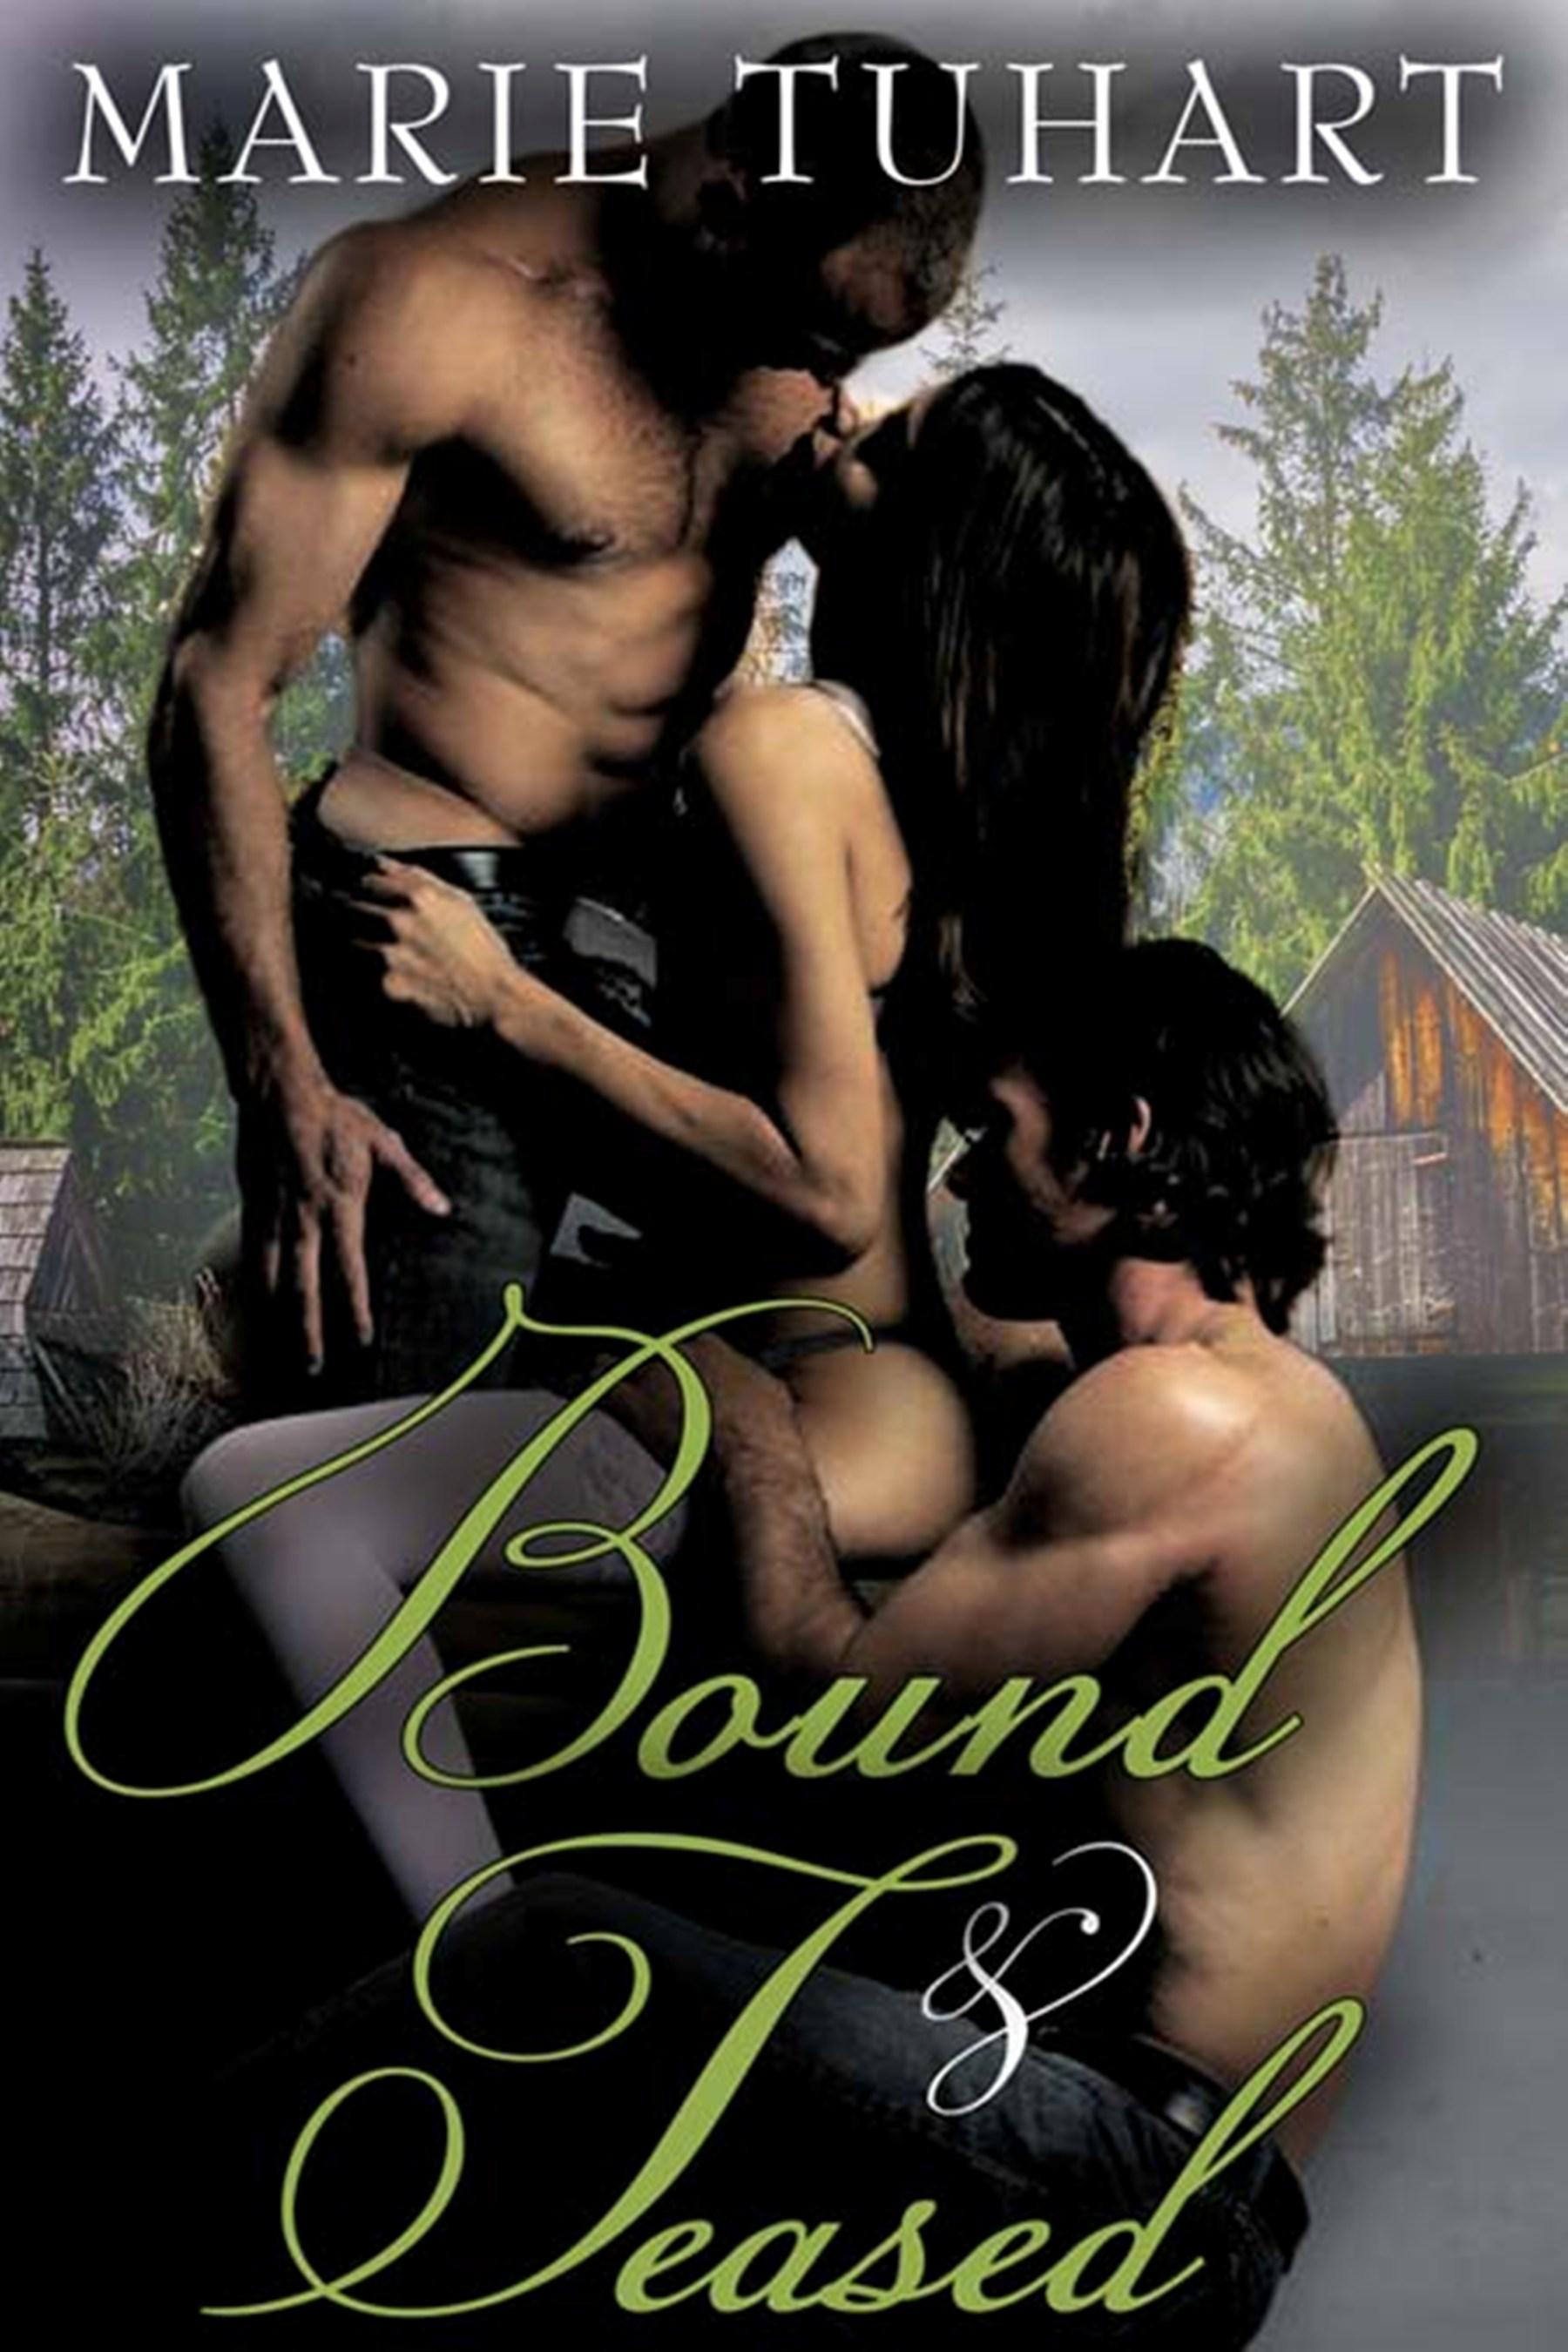 BoundAndTeased_w9731_750